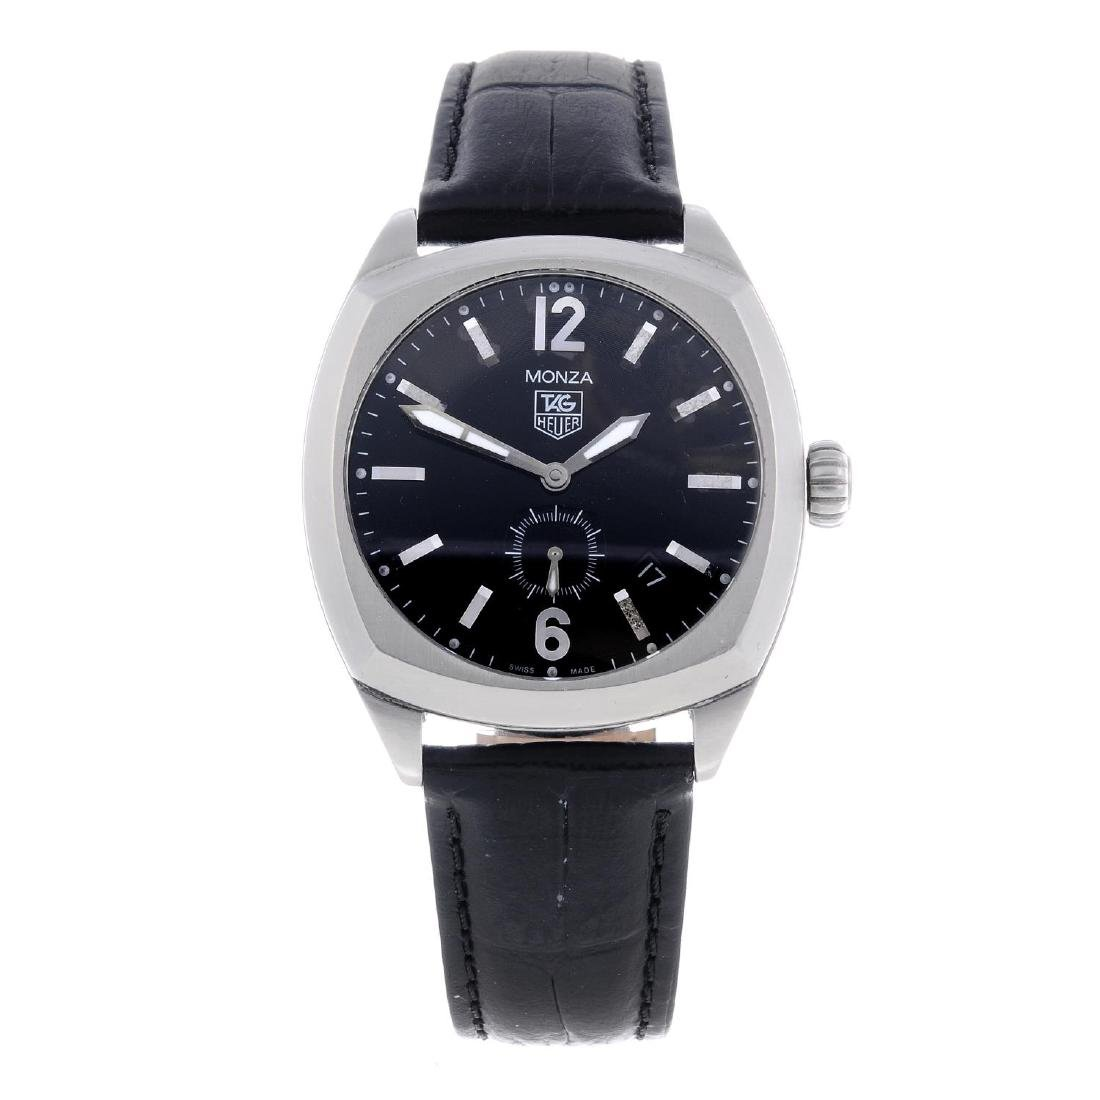 TAG HEUER - a gentleman's Monza wrist watch. Stainless